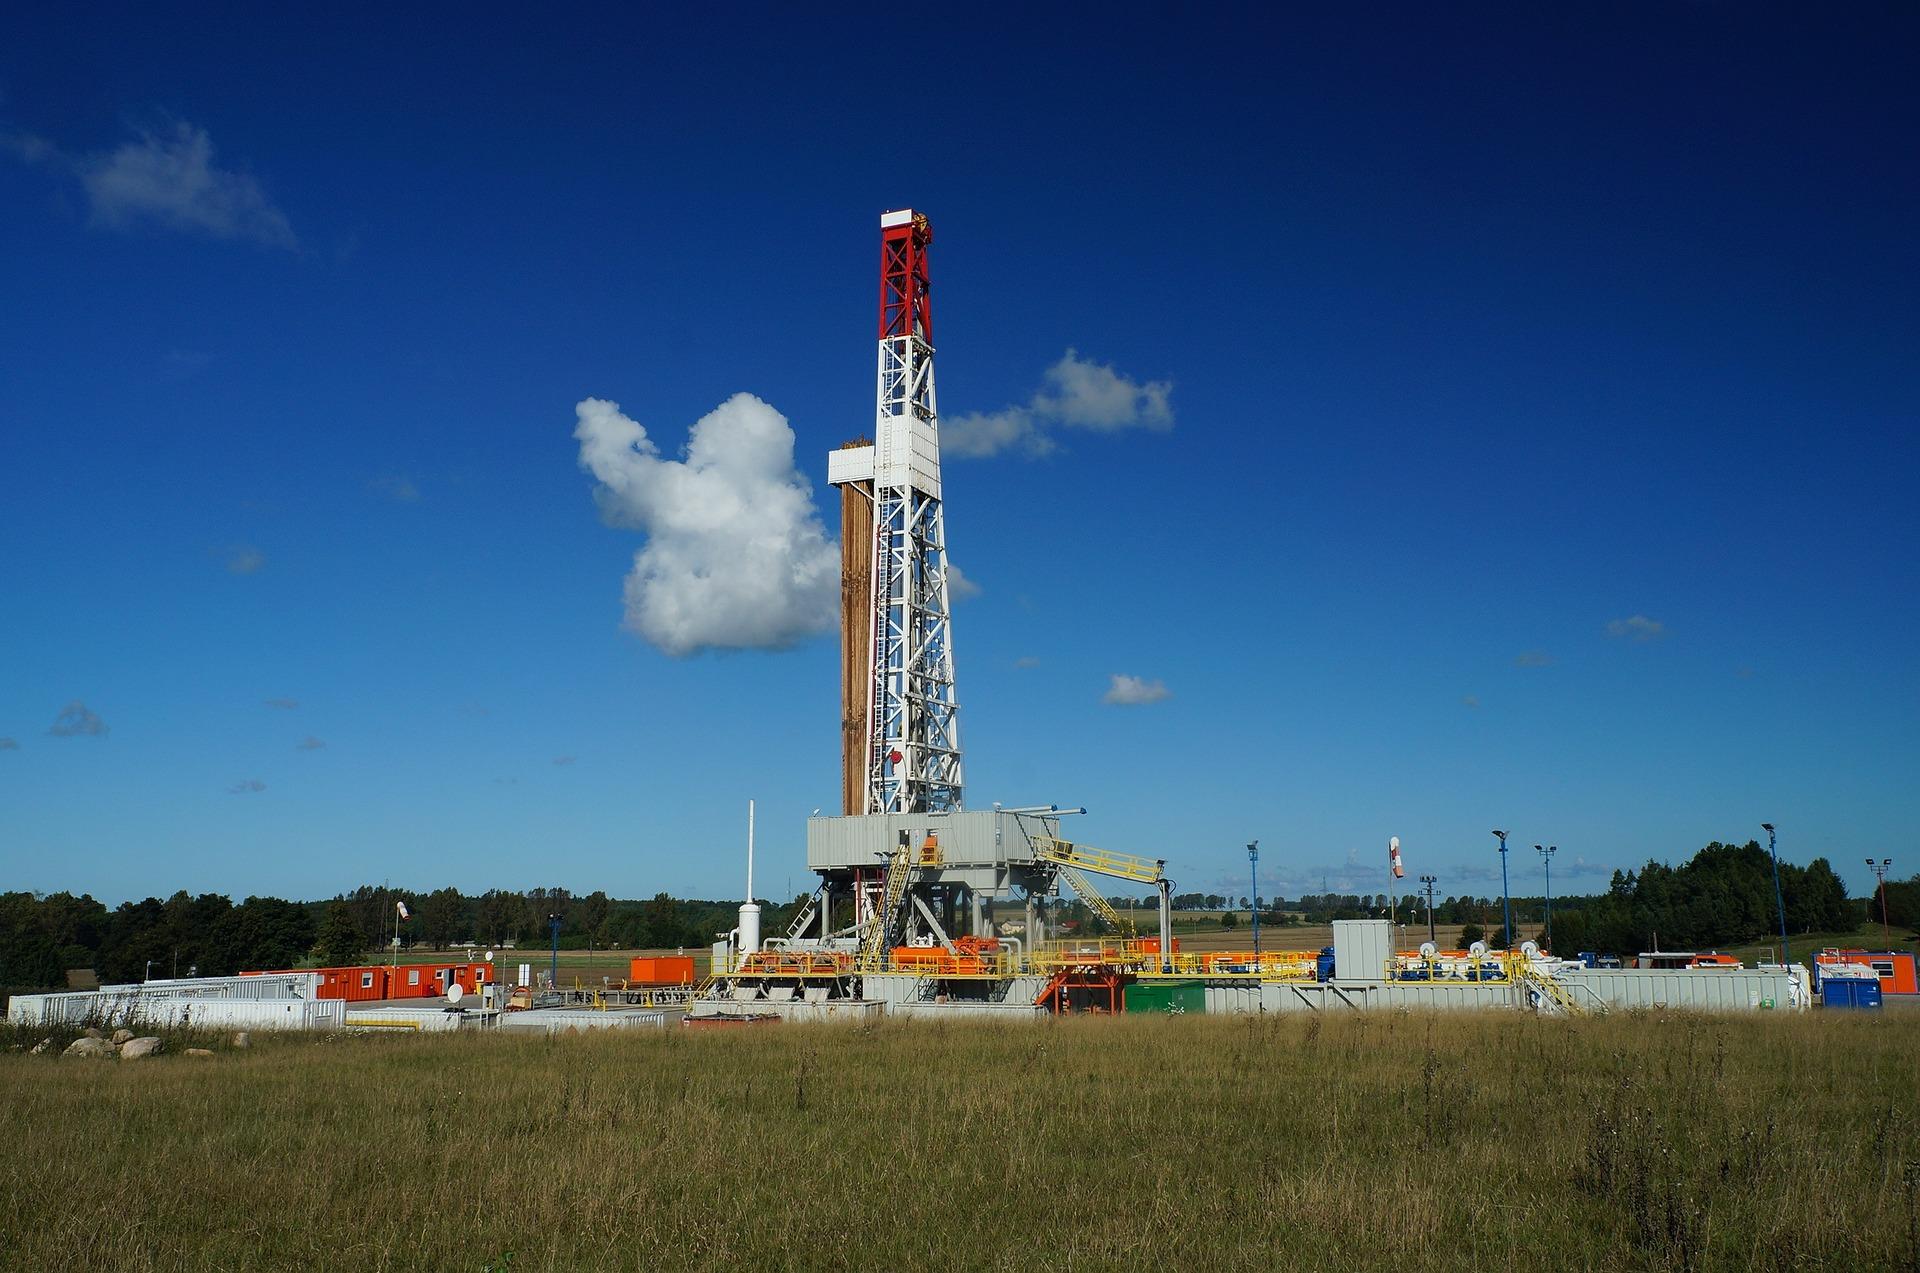 Centralized dehydration requires aggressive pipeline corrosion control